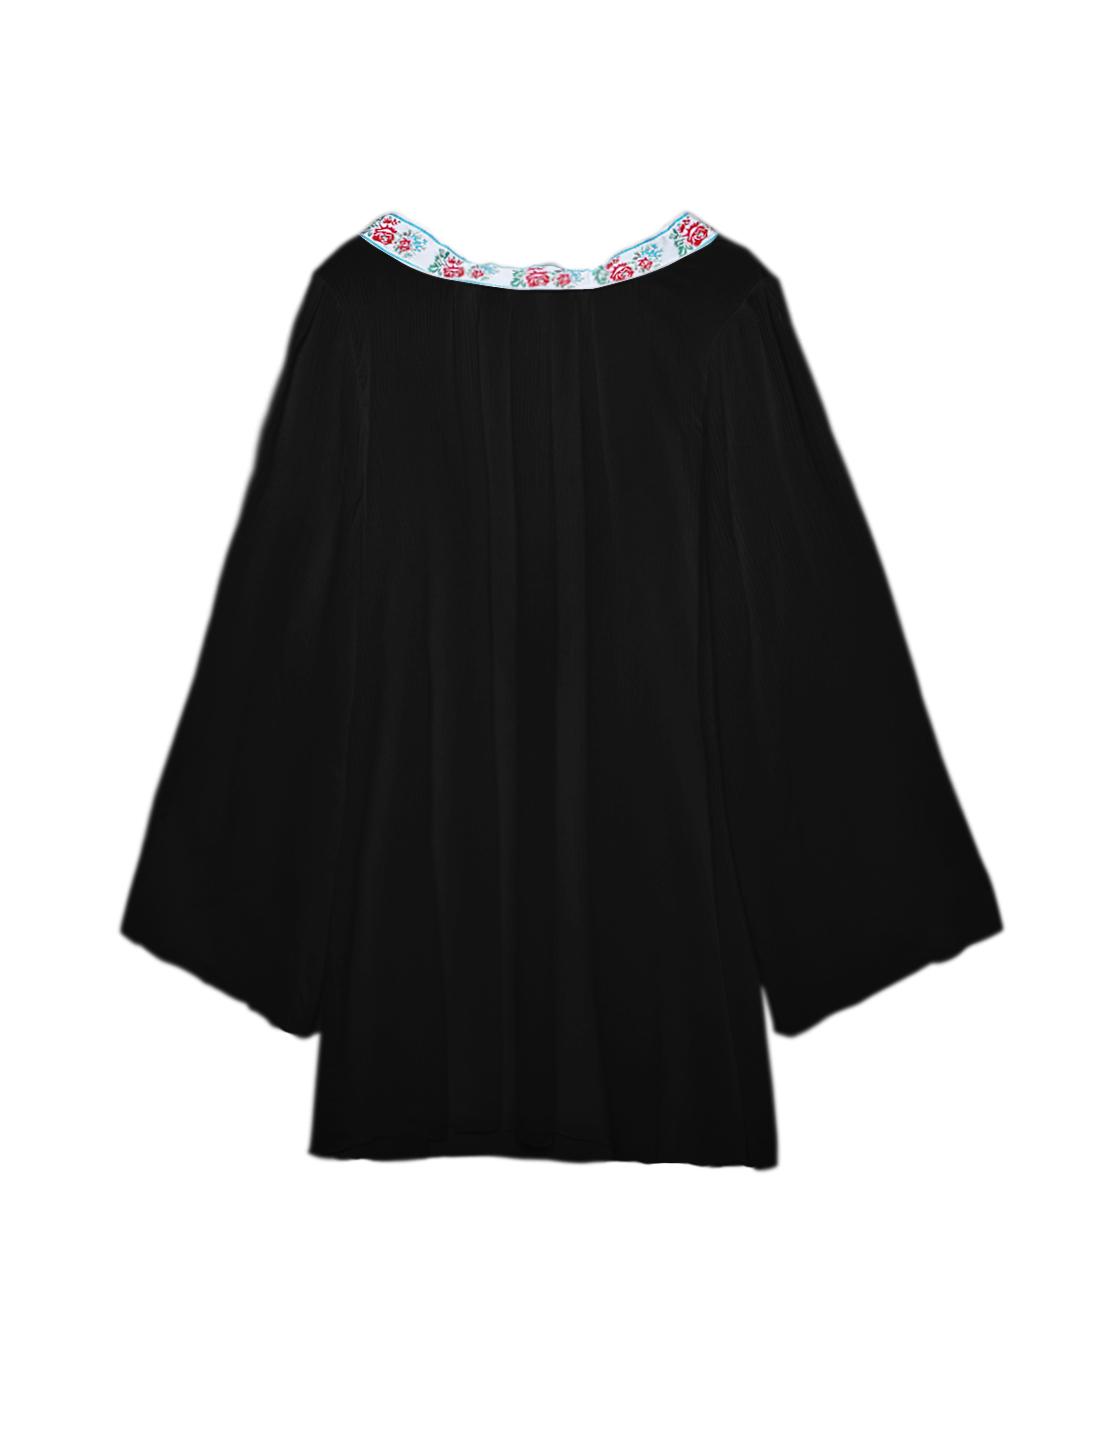 Women Kimono Floral Embroidery Deep V Back Tunic Top Black XS